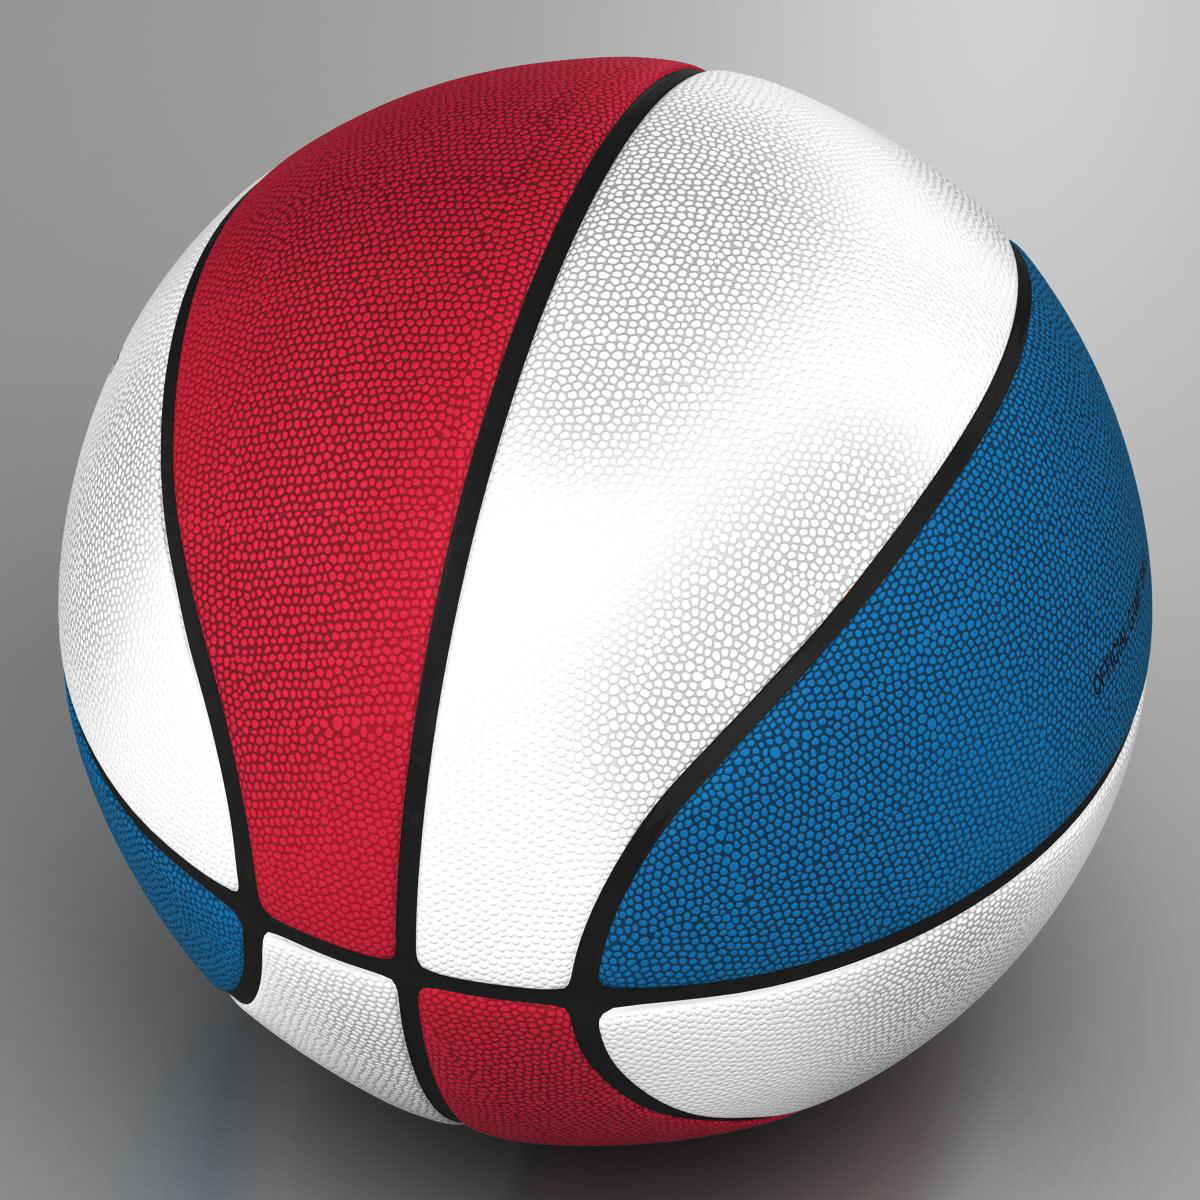 tricolor basketball ball 3d model 3ds max fbx c4d ma mb obj 164848